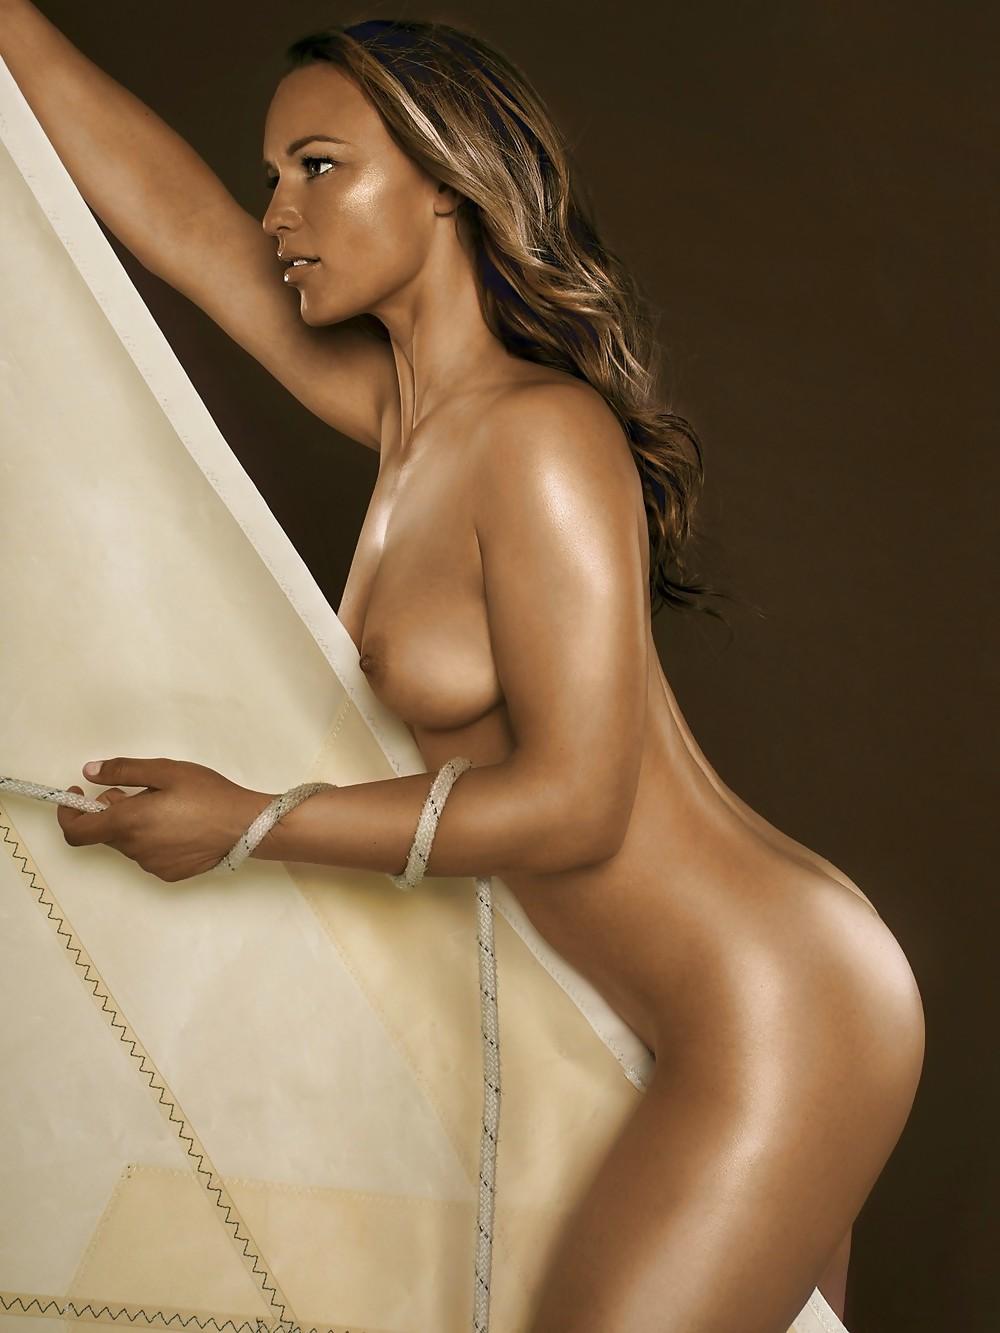 Olympic --Babes Naked -2012 - 30 Pics - Xhamstercom-9357